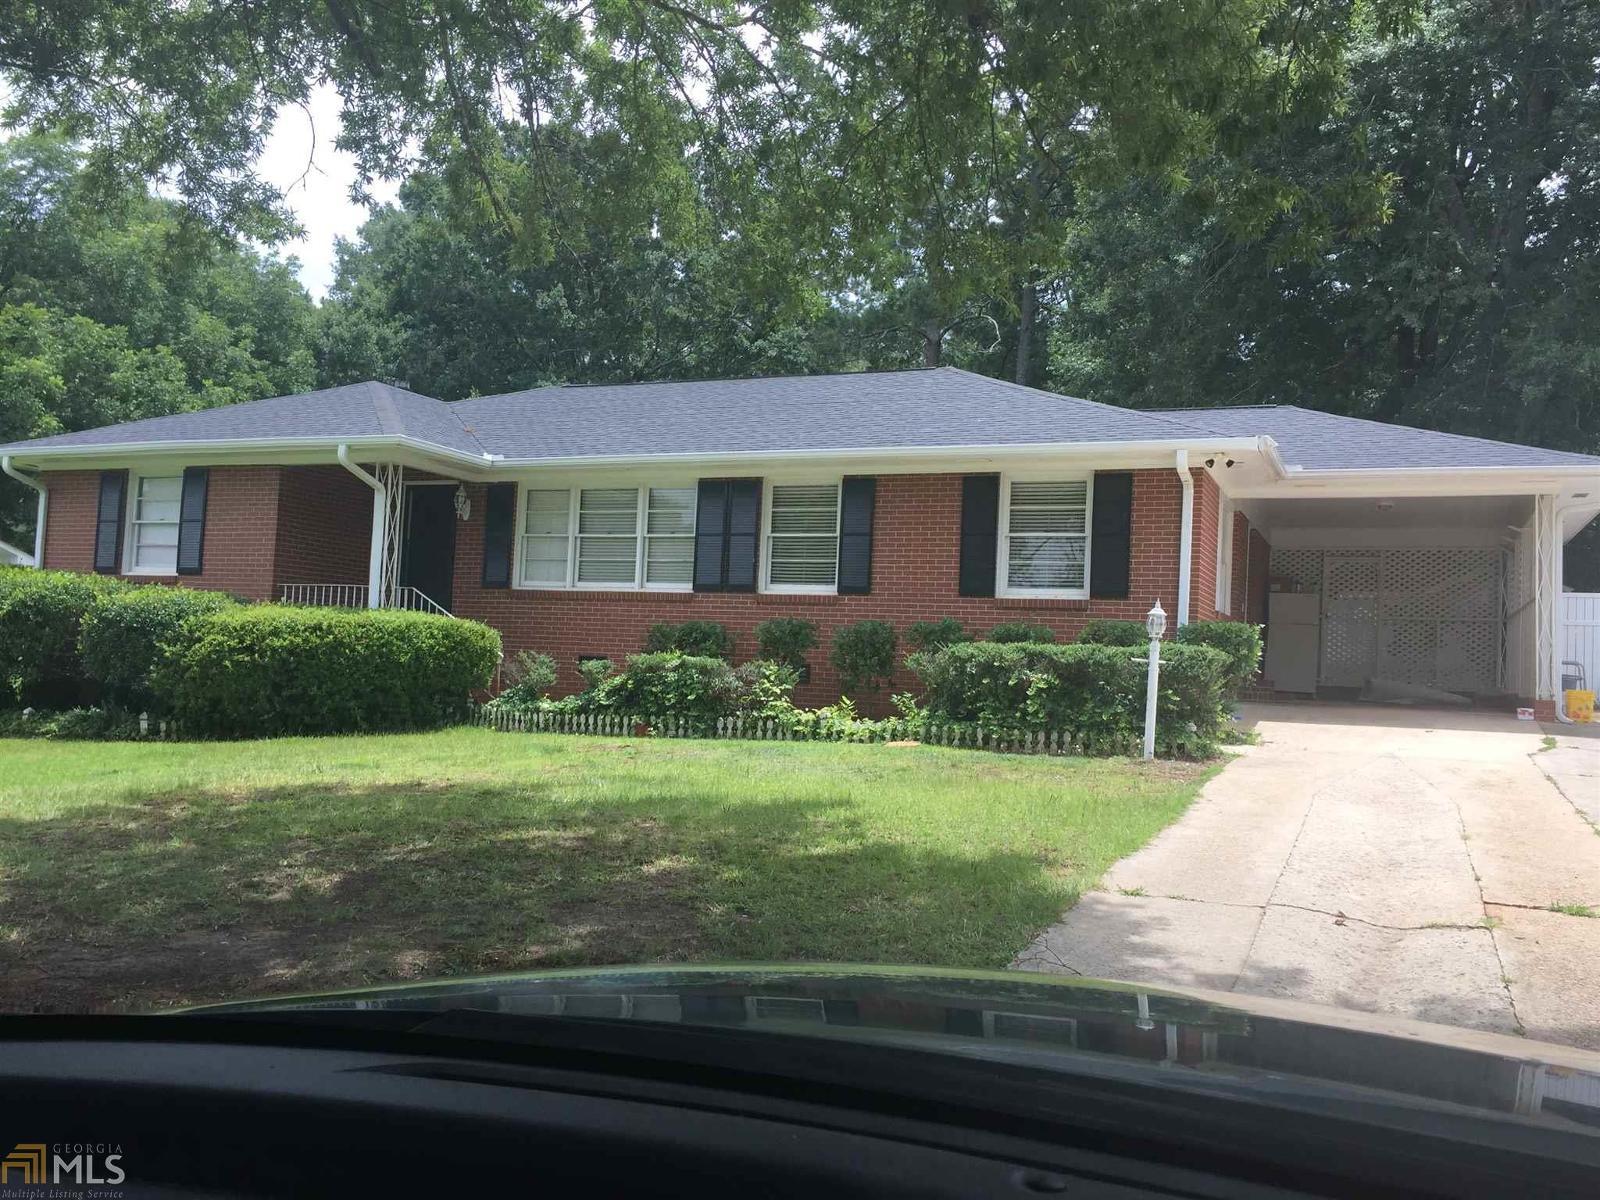 Home For Sale On Pine Street In Barnesville Ga